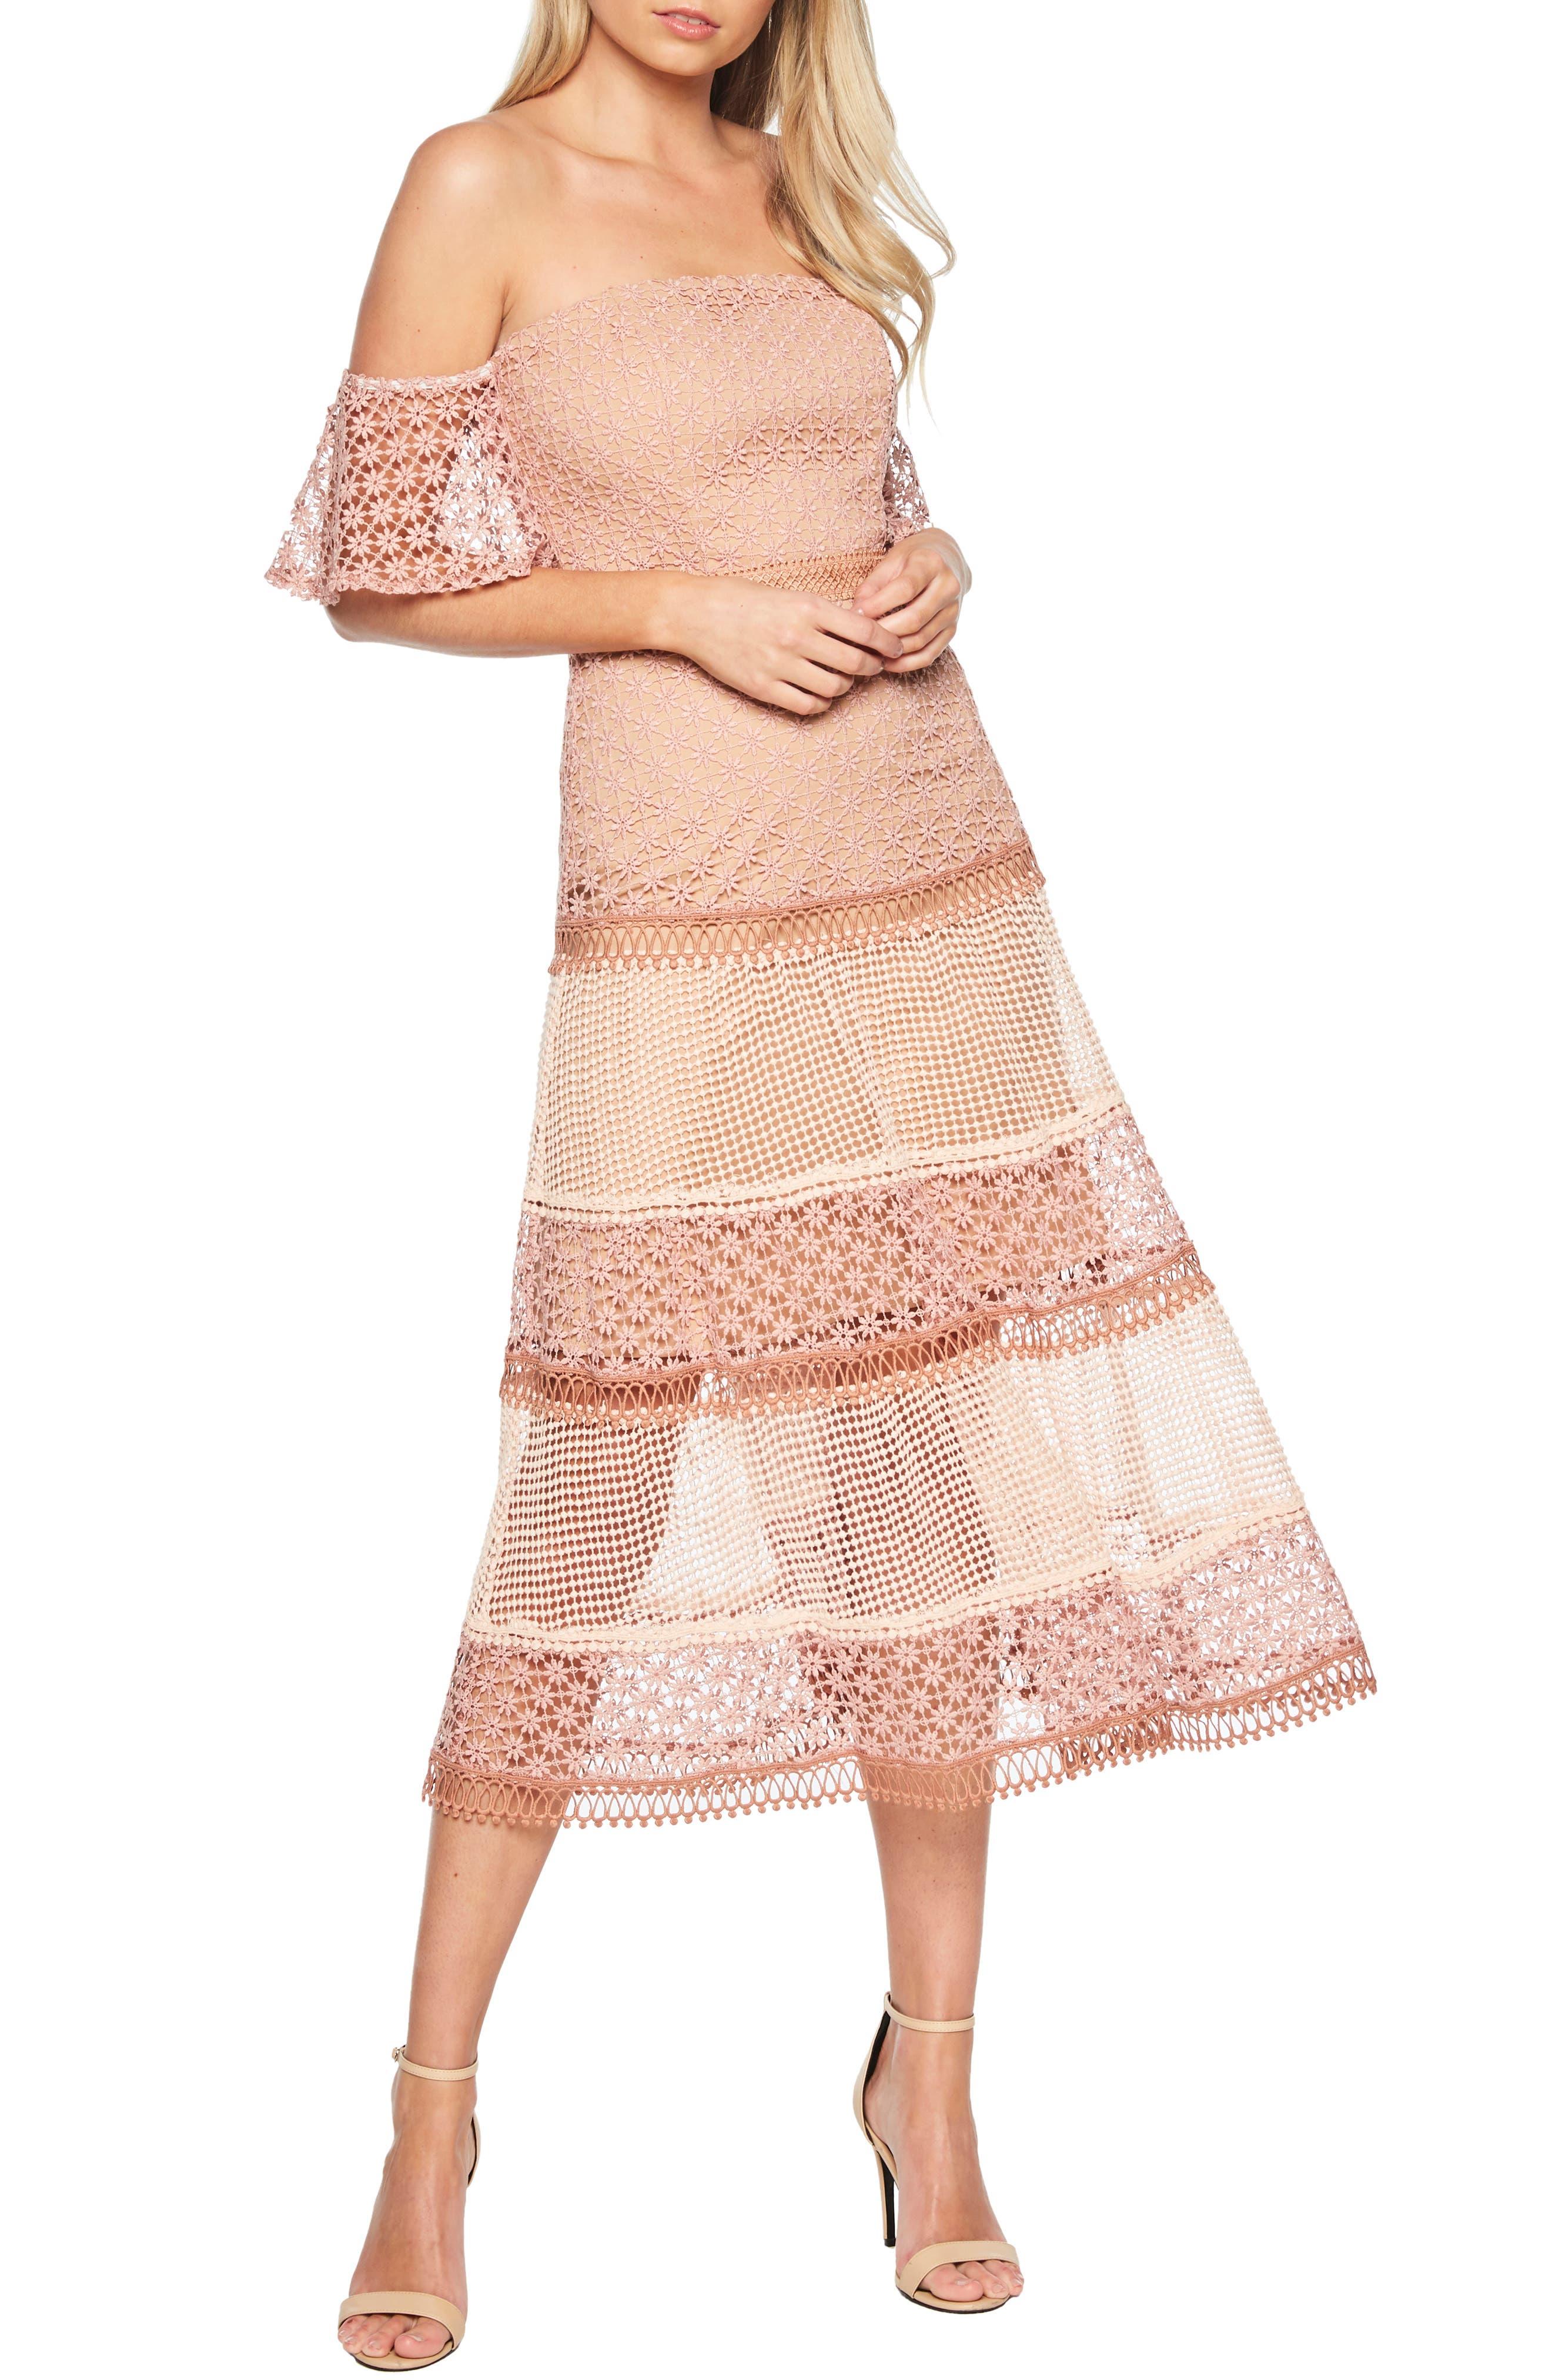 BARDOT Kristen Off the Shoulder Lace Midi Dress, Main, color, 680